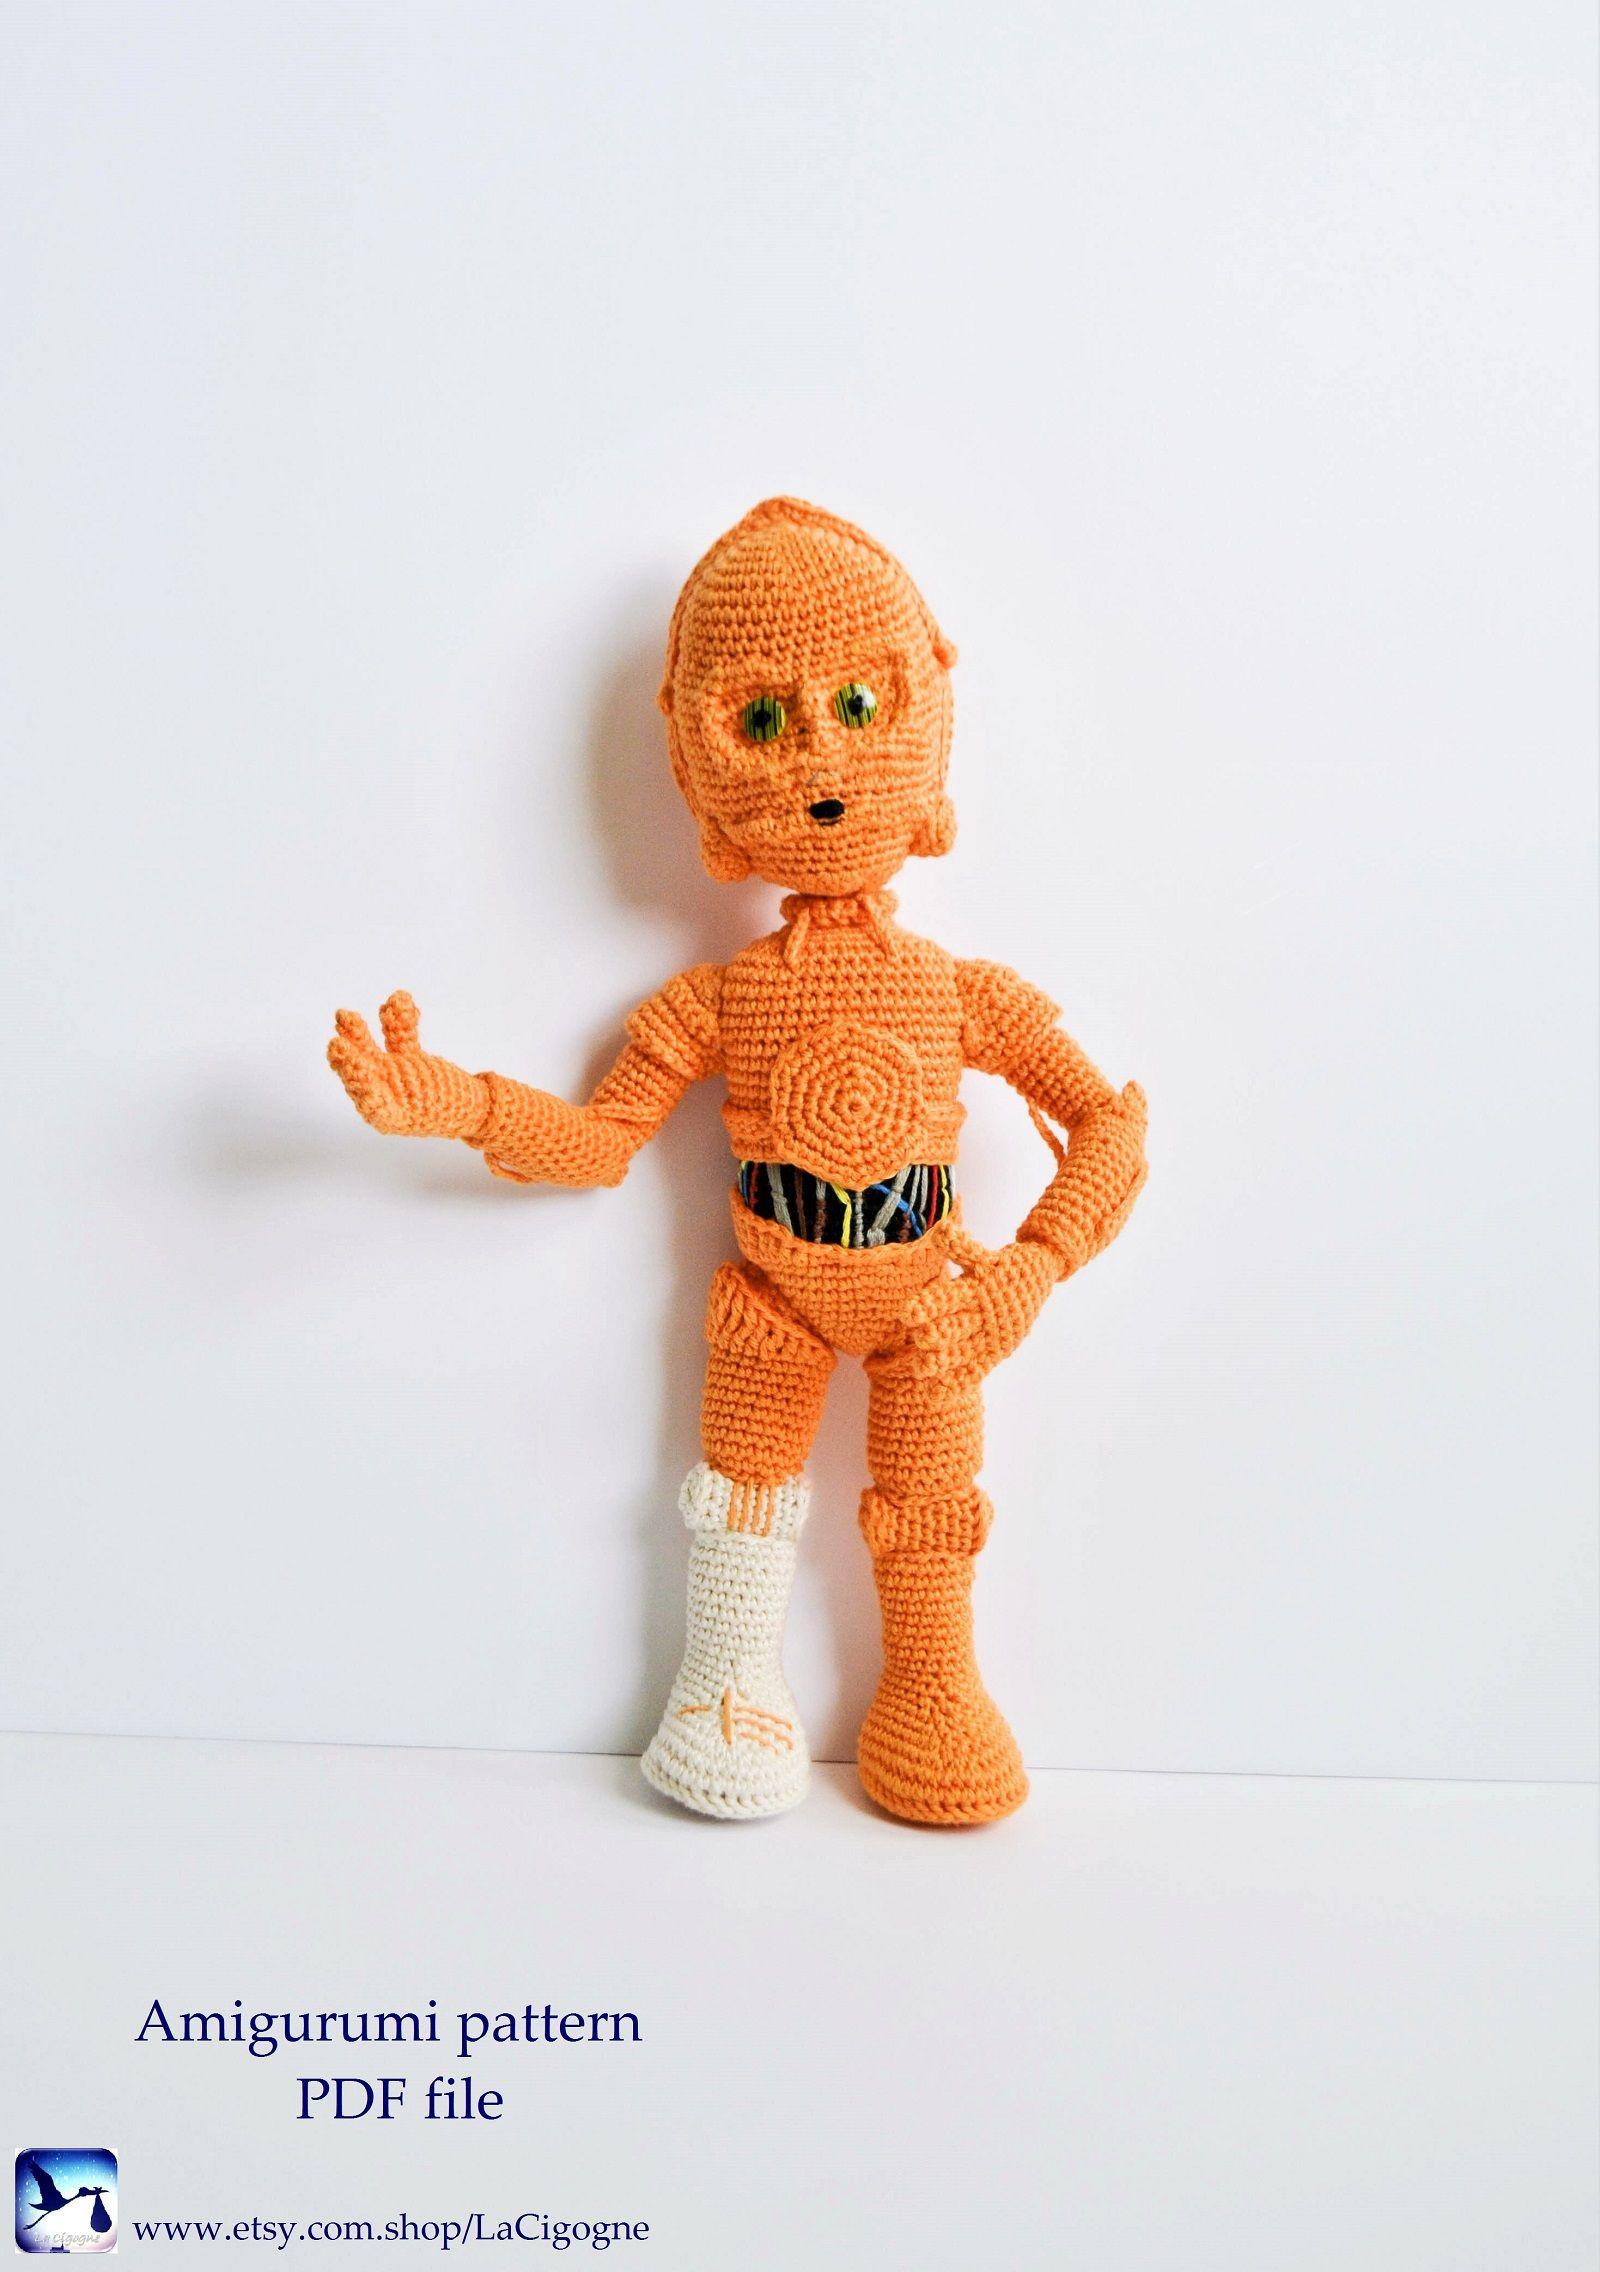 Star wars crochet amigurumi pattern C3PO Amigurumi toy #crochet ...